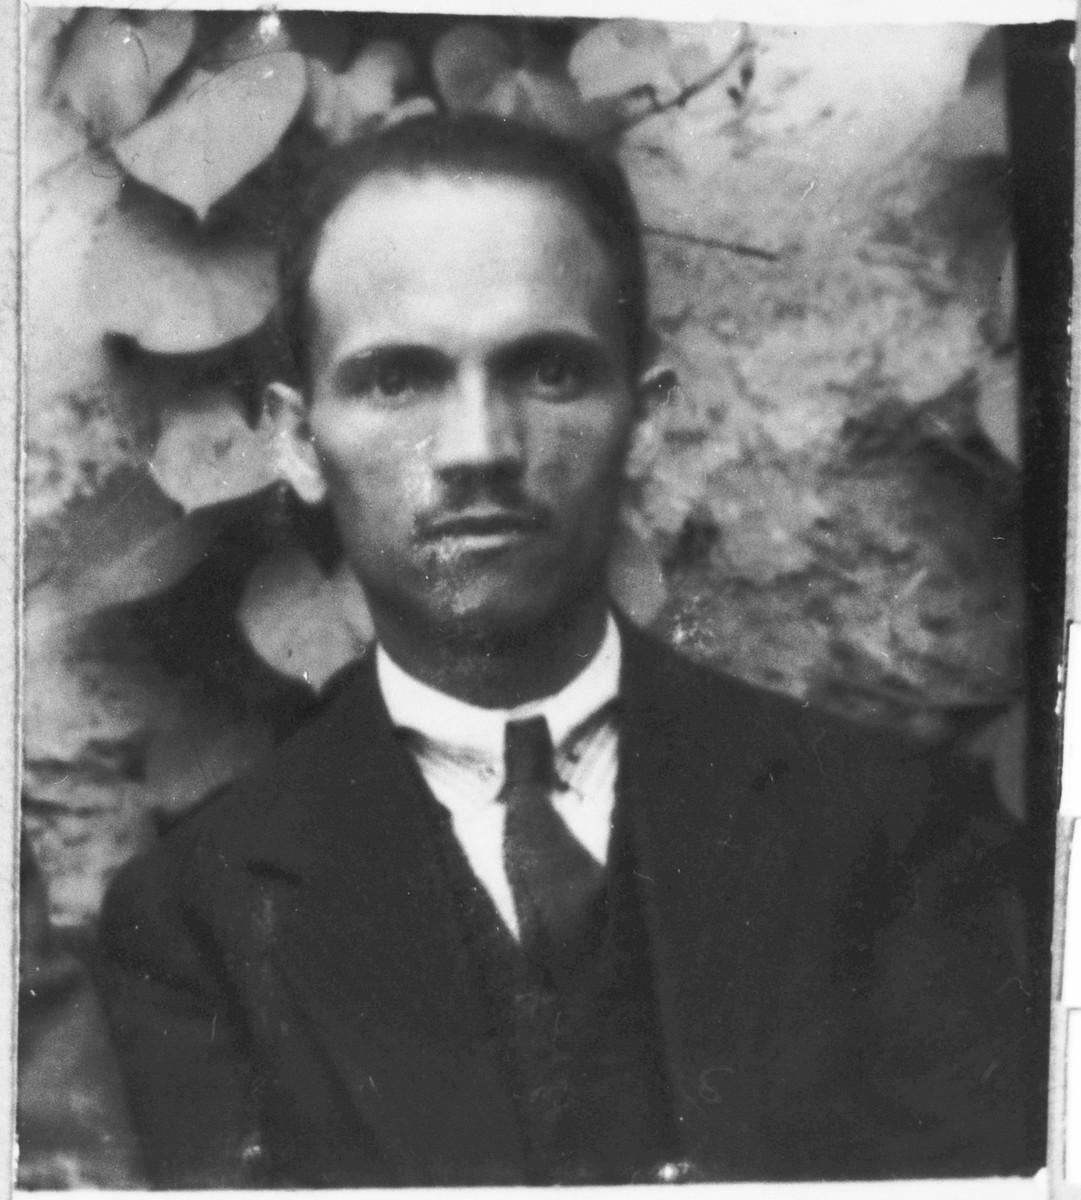 Portrait of Avram Aruti, son of Mushon Aruti.  He was a jeweler.  He lived at Novatska 16 in Bitola.